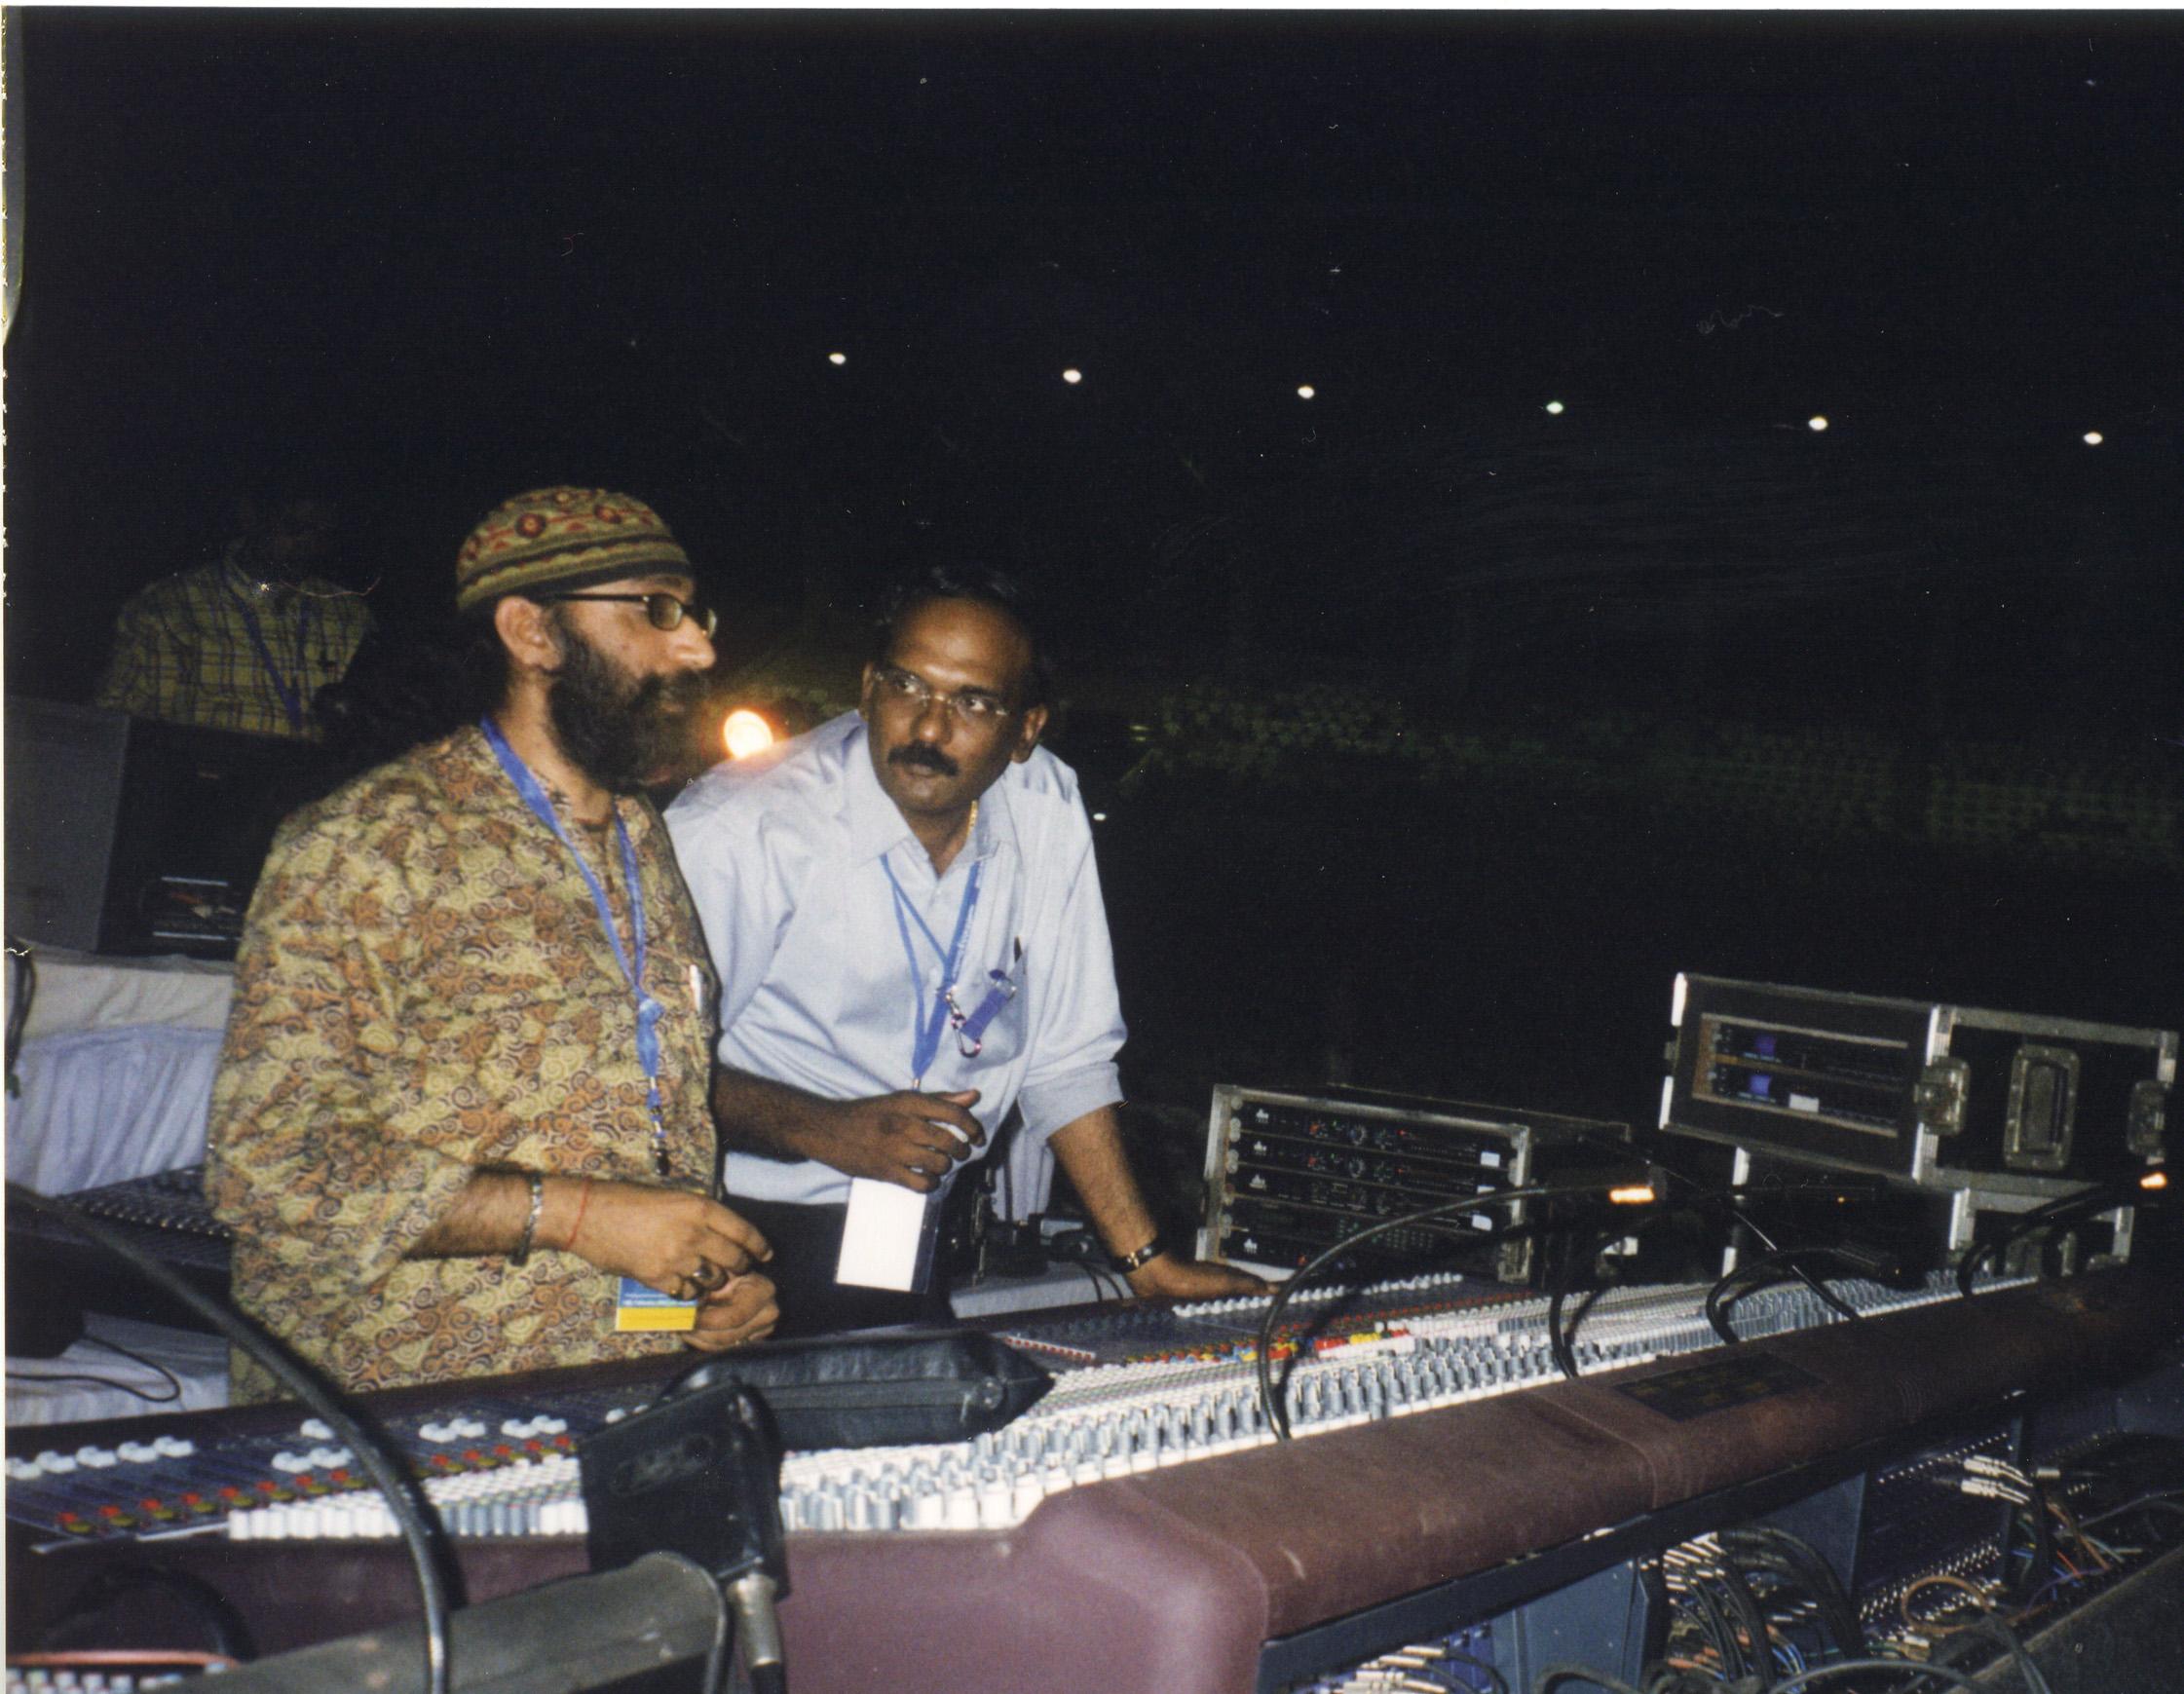 AR Rahman-Unity Of Light Concert, Hydera